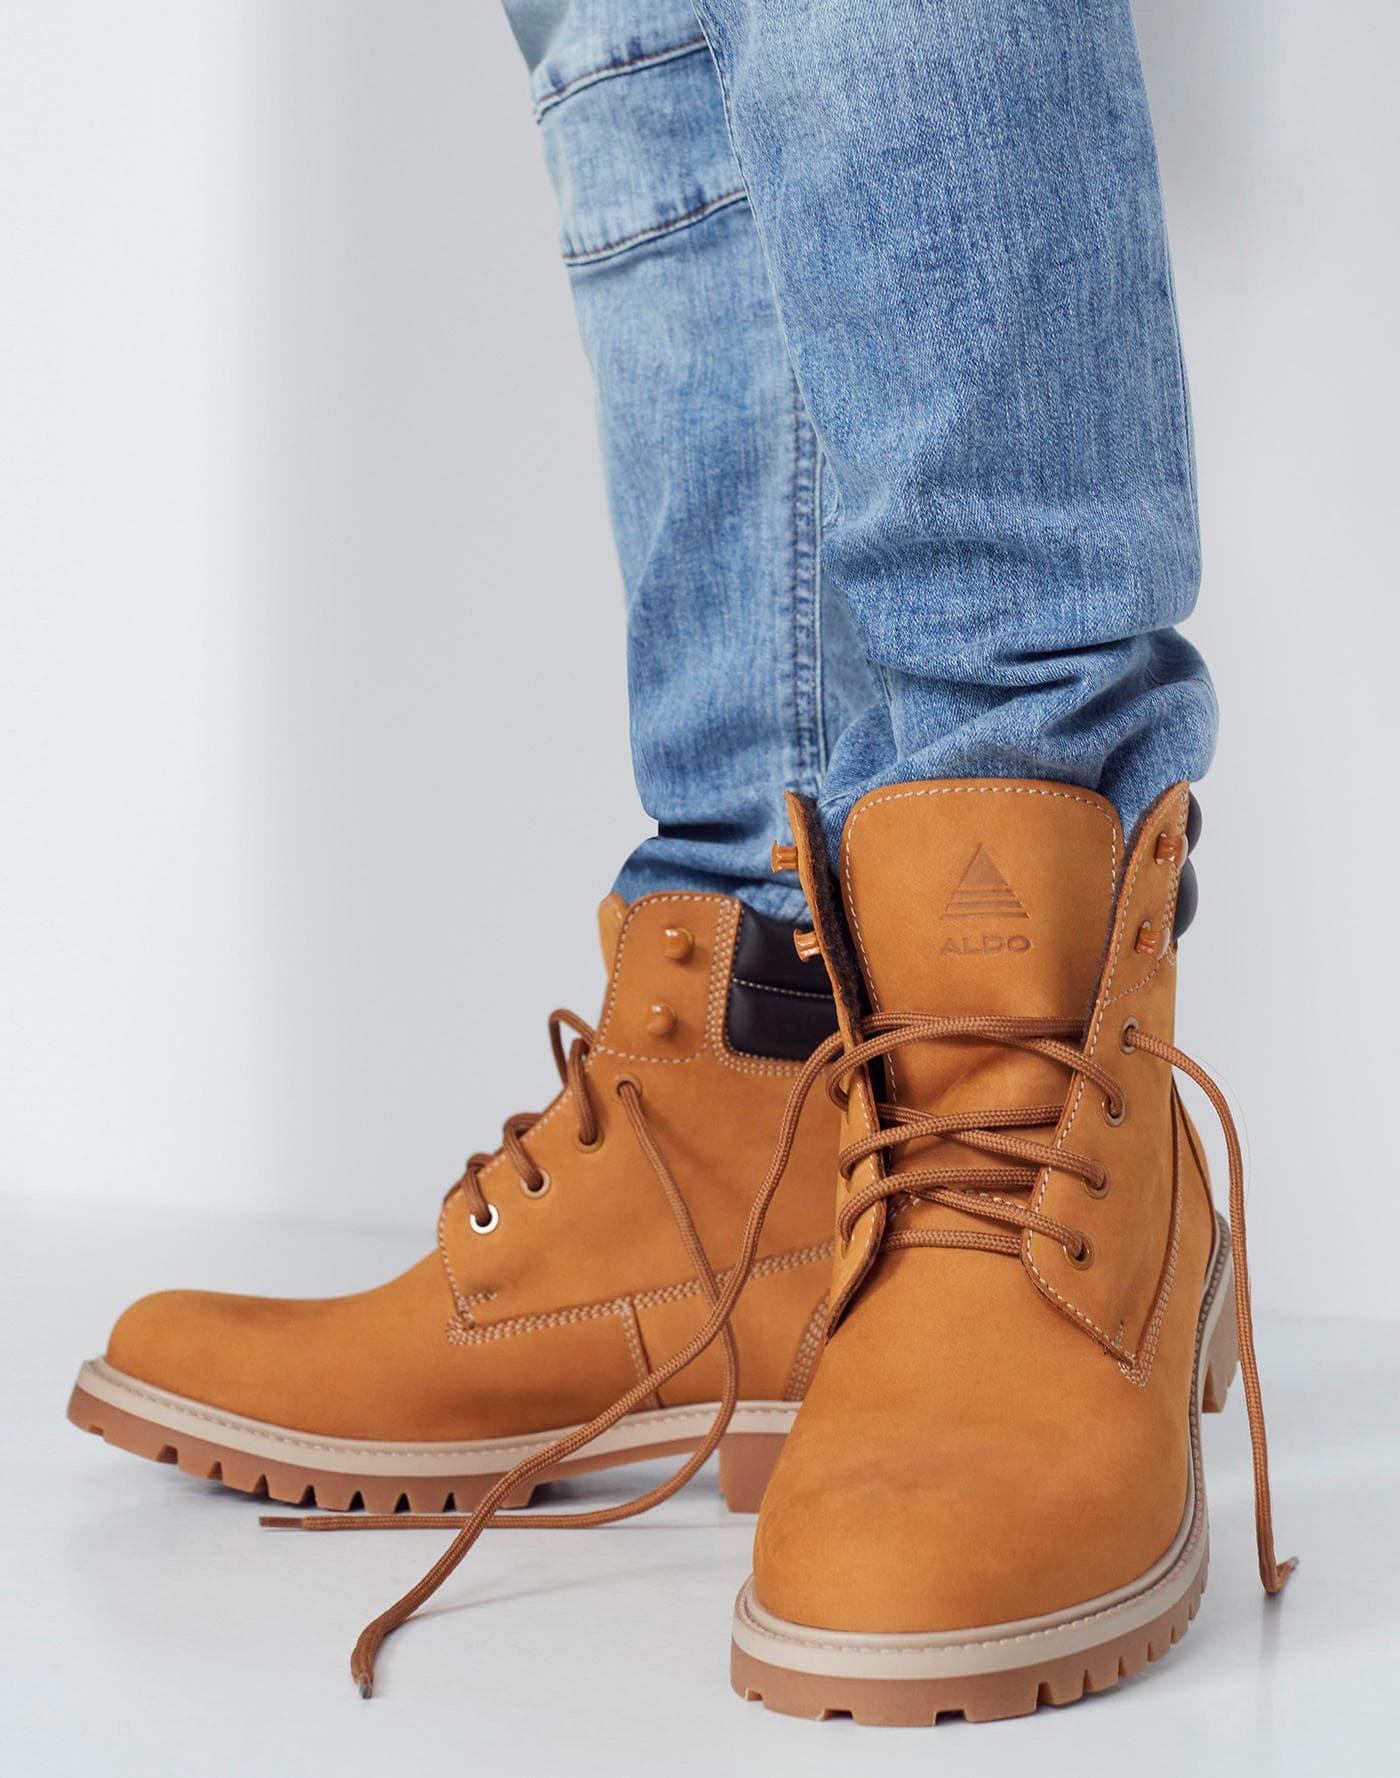 The Boot Shop Us Sepatu Tactical Boots Delta 6in Desert Tan